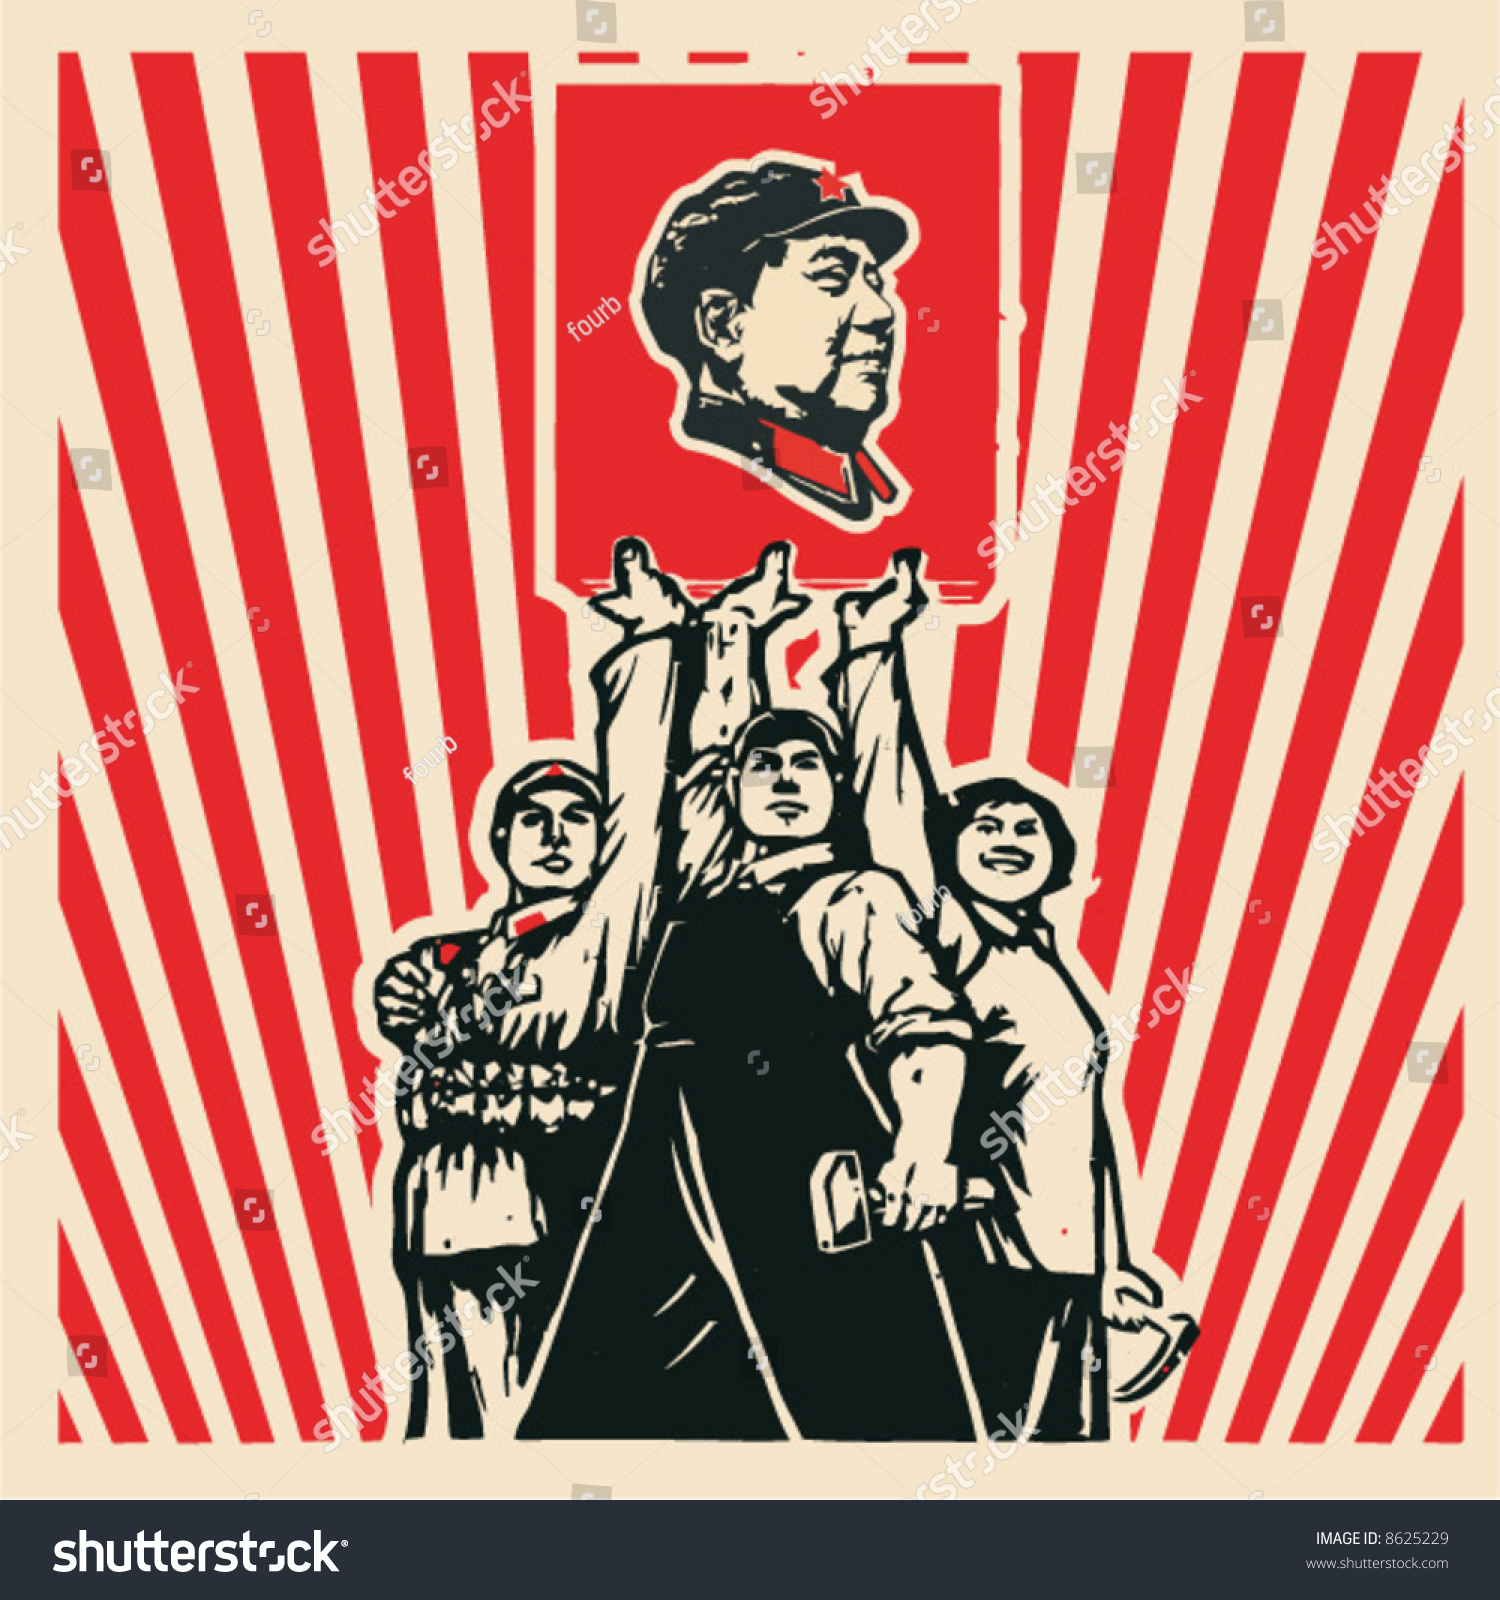 Old Communism Poster Stock Vector 8625229 - Shutterstock